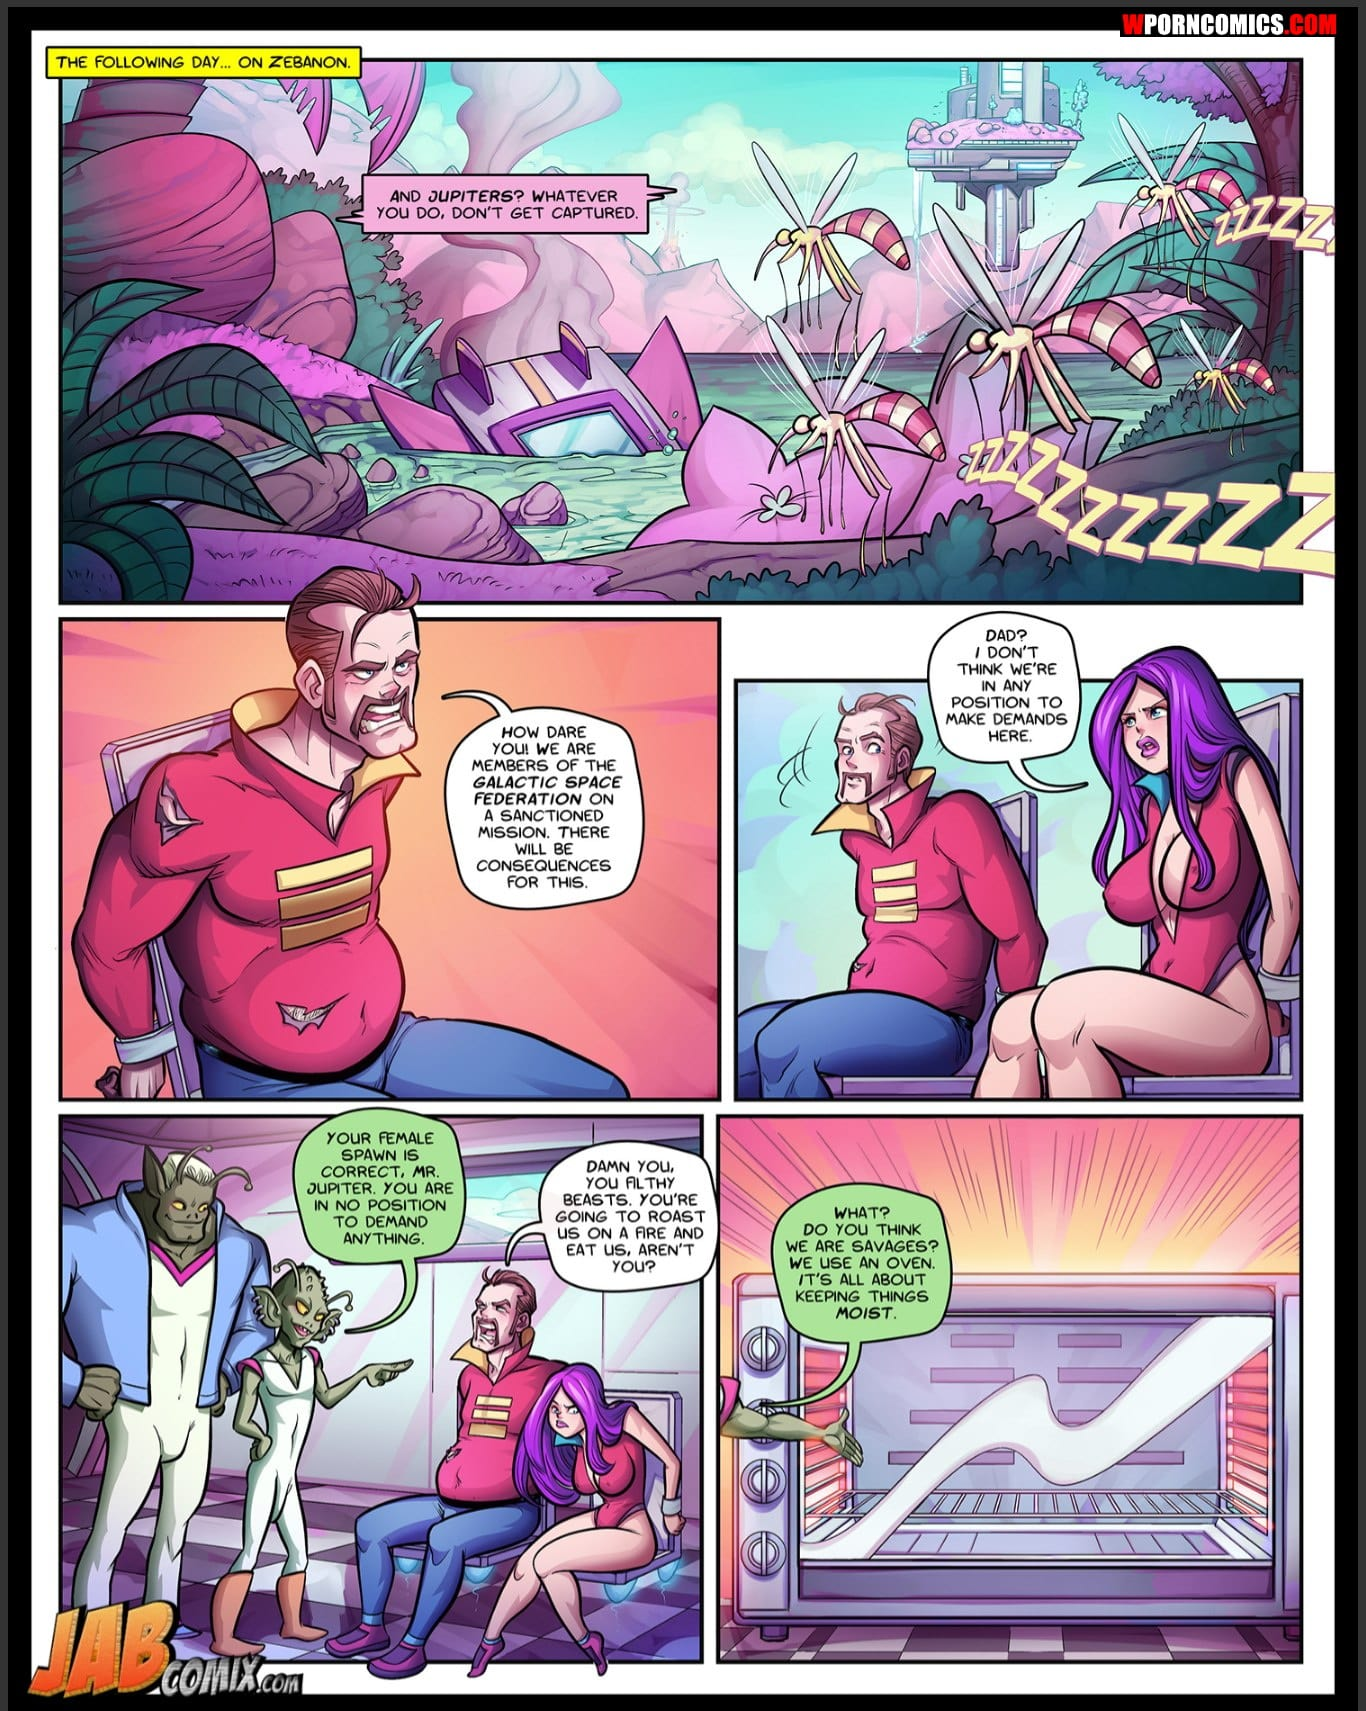 porn-comic-Jenny-Jupiter-part-2-2020-03-11/porn-comic-Jenny-Jupiter-part-2-2020-03-11-5375.jpg